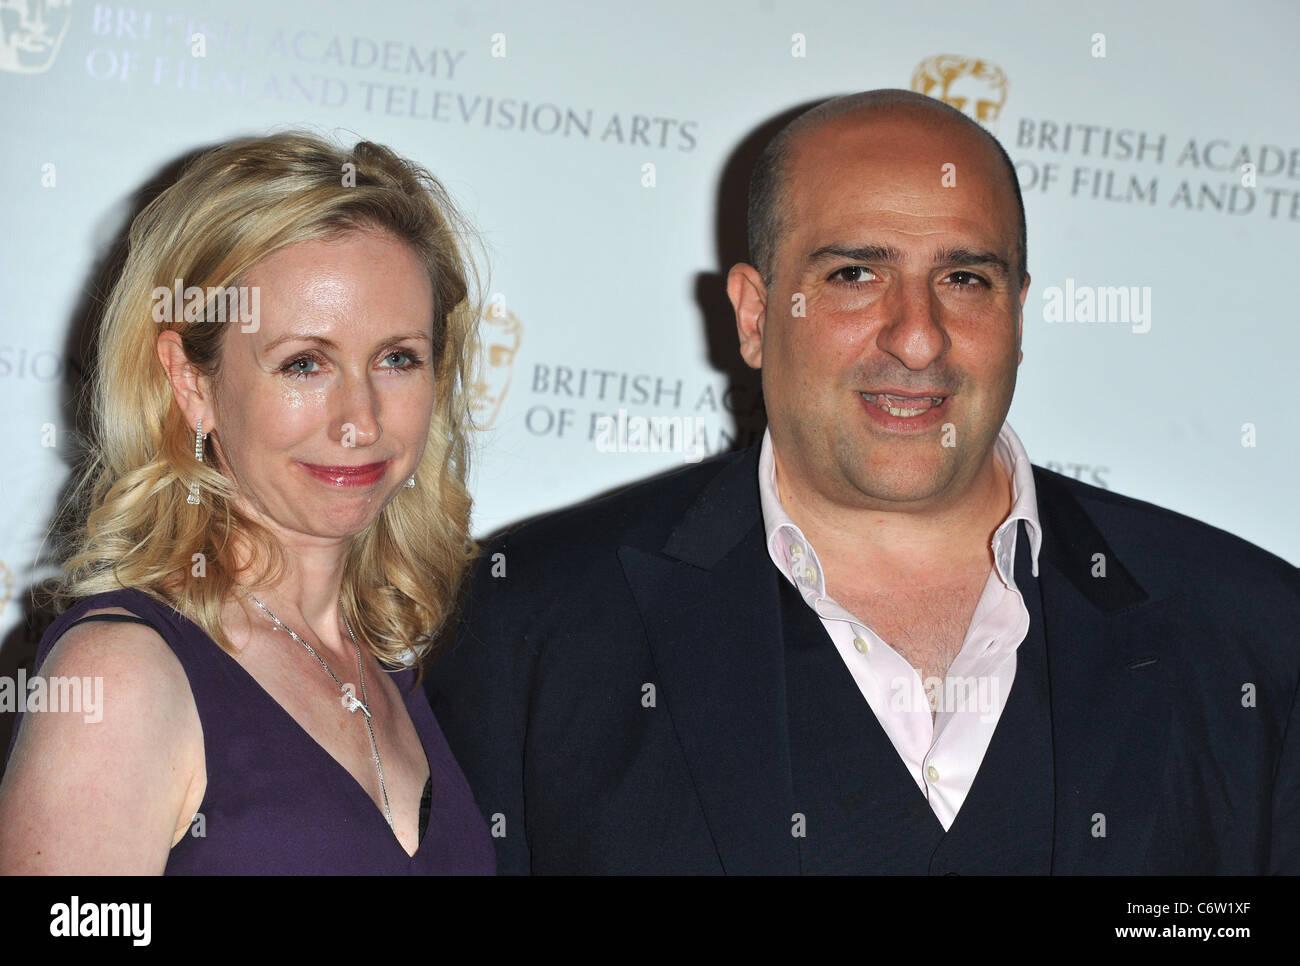 Omid Djalili and wife British Academy Television Craft Awards held at the London Hilton. London, England - 23.05.10 - Stock Image